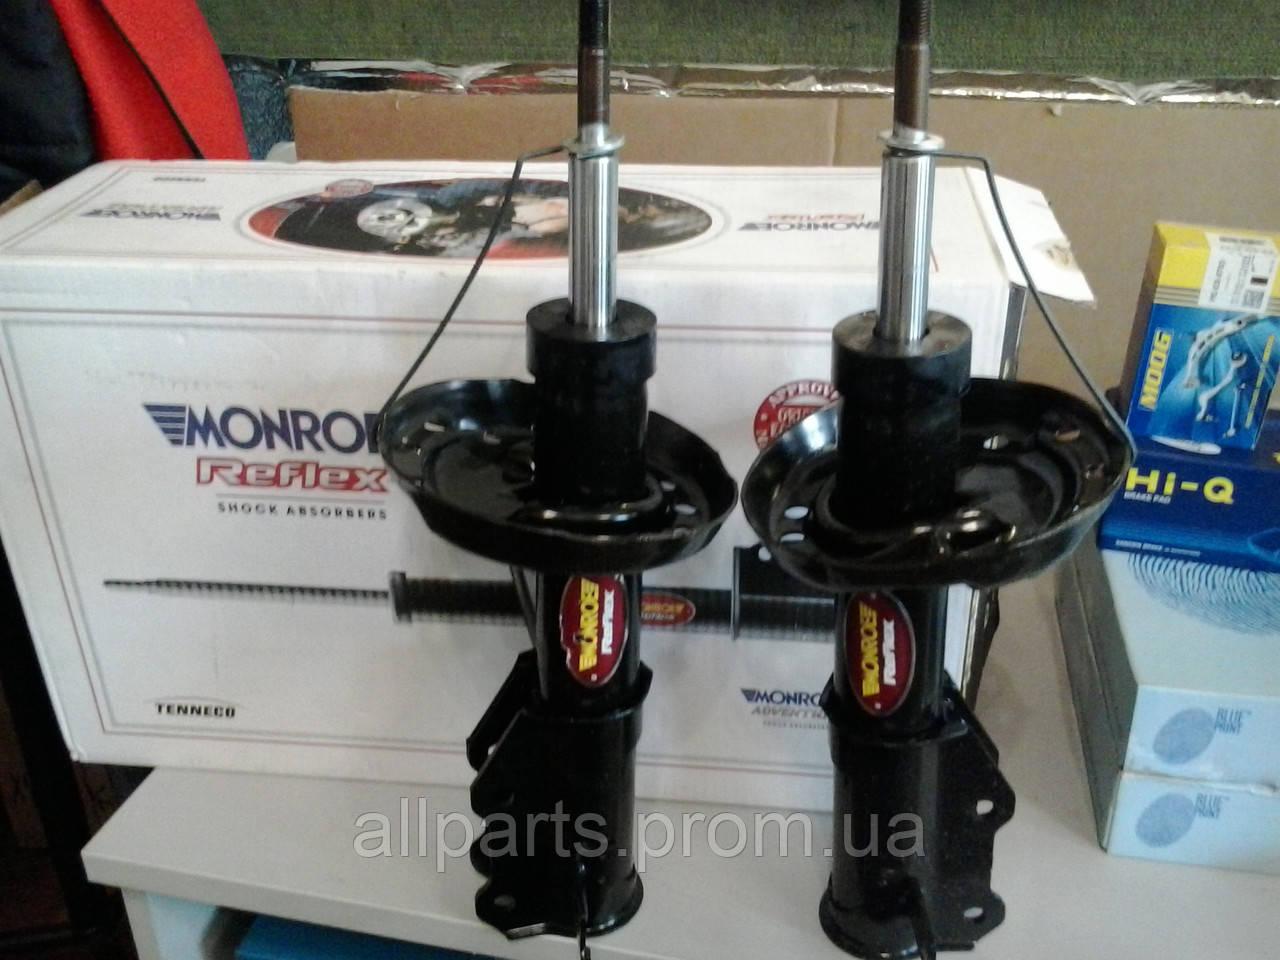 8fad0dbea Амортизаторы производителя Monroe (стойки Монро) - AllParts.com.ua —  интернет-